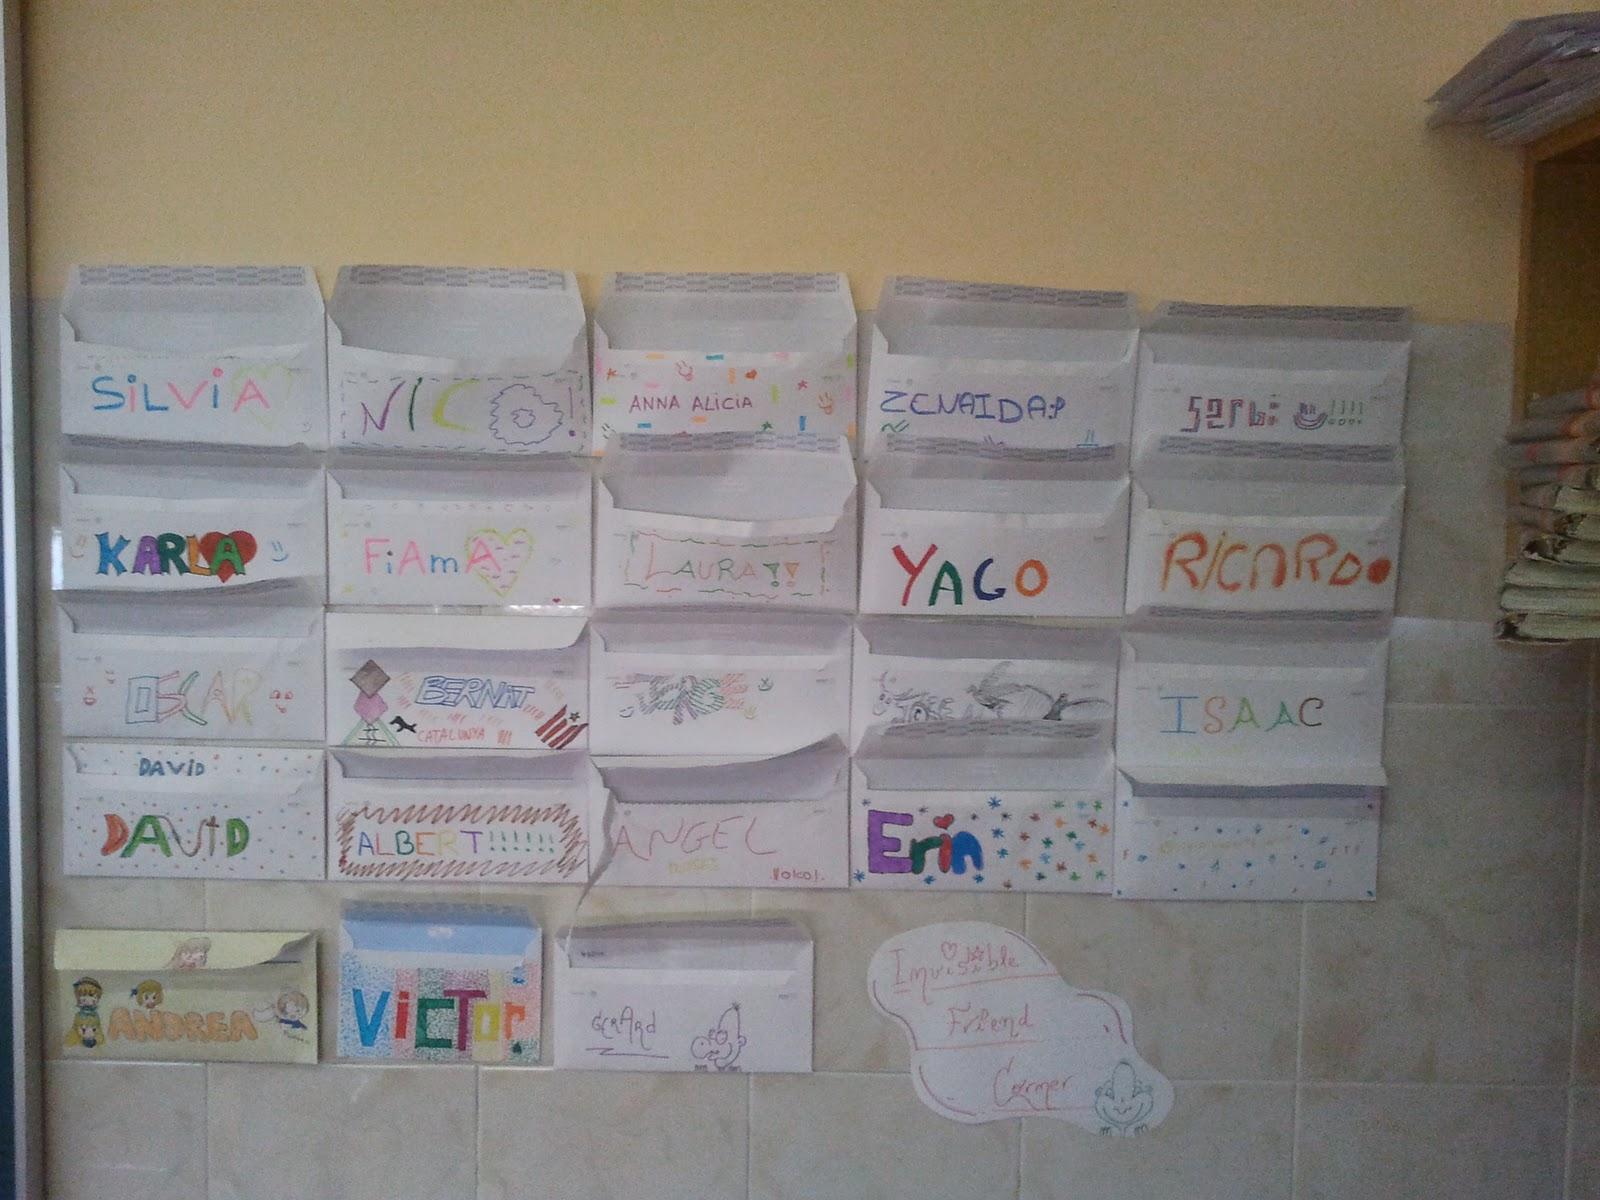 http://4.bp.blogspot.com/-movH5333MSk/TuuSWjVOiqI/AAAAAAAAANE/c7KX5mmBDYk/s1600/untitled.bmp